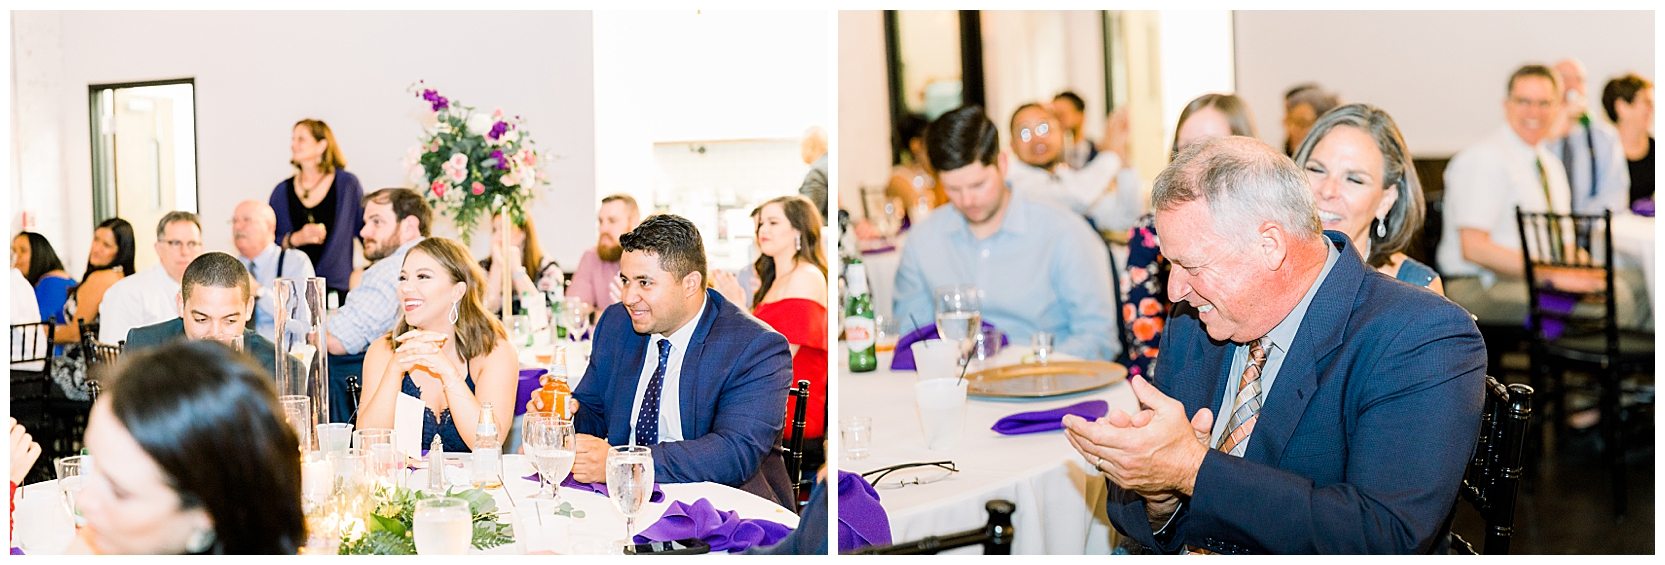 jessicafredericks_lakeland_tampa_wedding_purple_crazy hour_0078.jpg